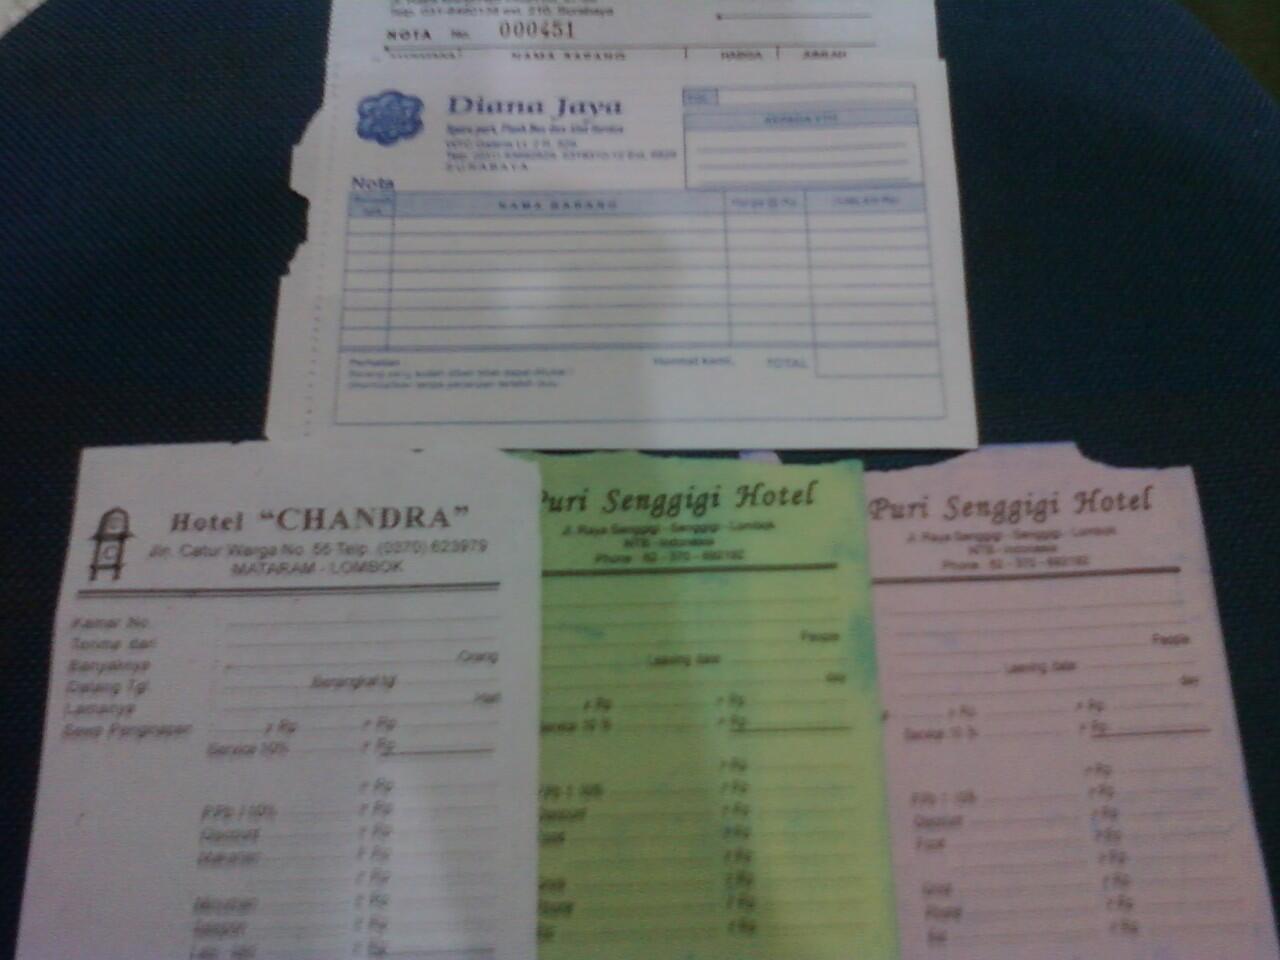 CF NCR/HVS CETAKAN & POLOS SEGALA UKURAN, RANGKAP (Ply) CONTINUOUS FORM